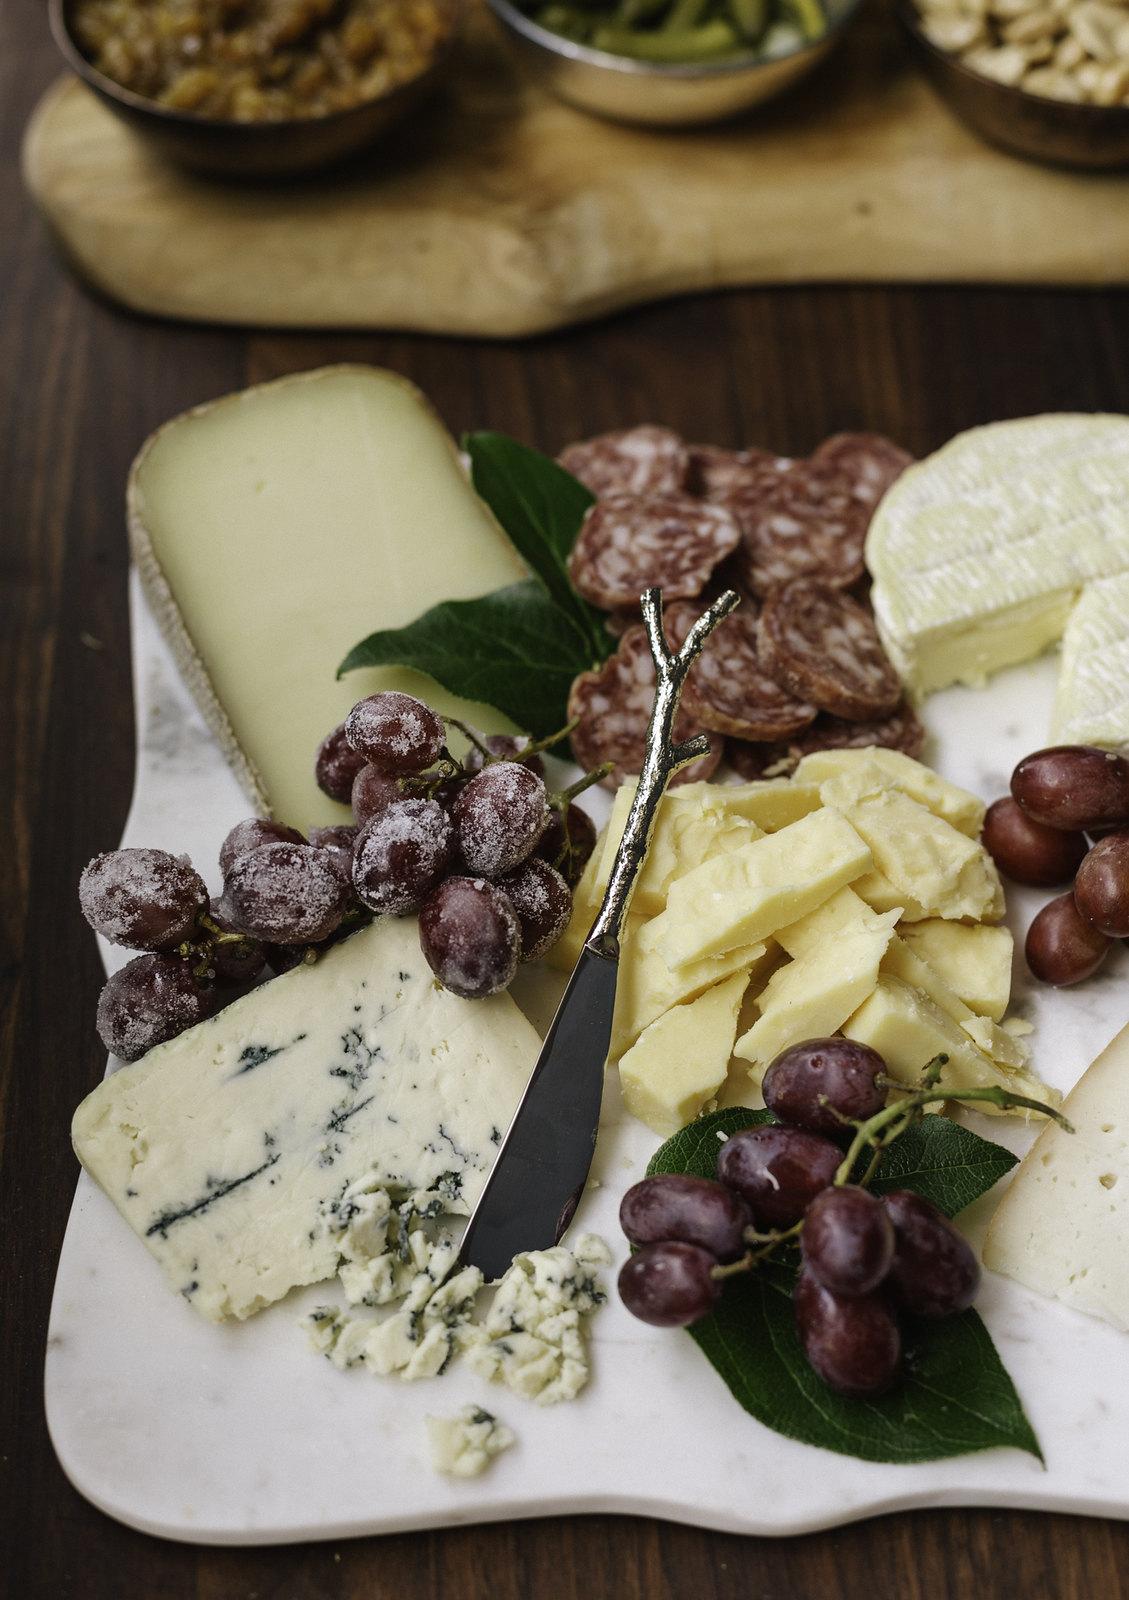 Cheese board + accompaniments #sponsored